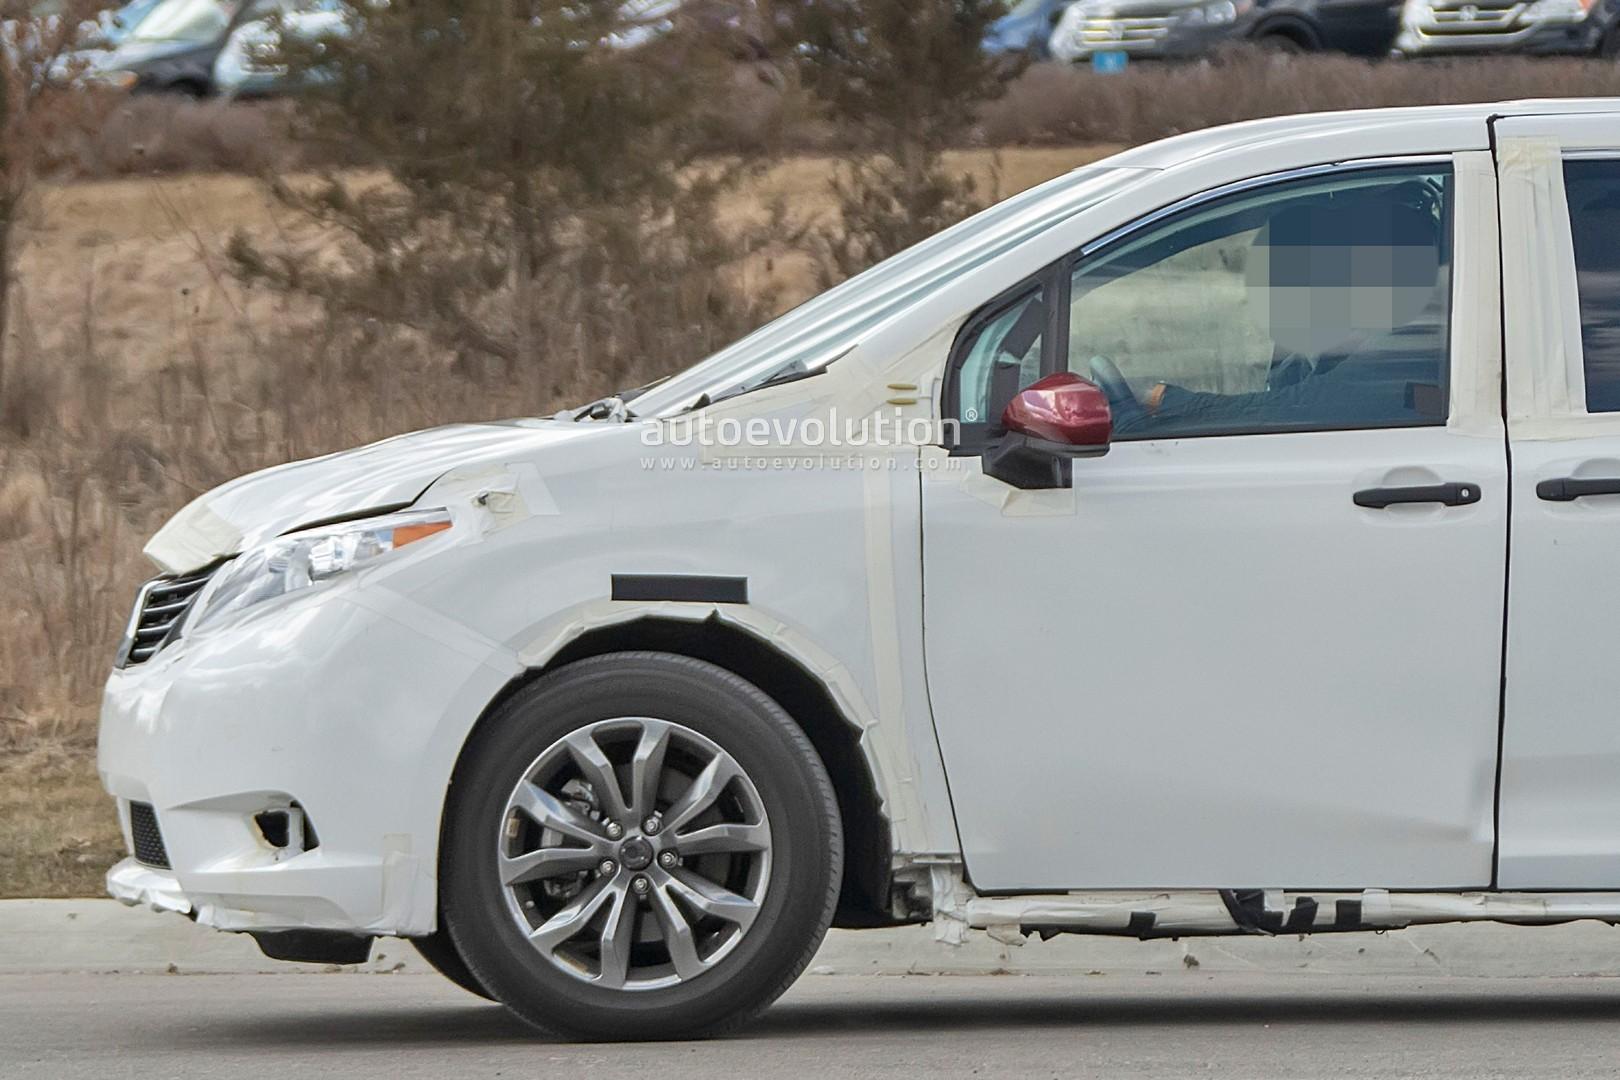 2021 Toyota Sienna Test Mule Previews Larger TNGA Minivan ...